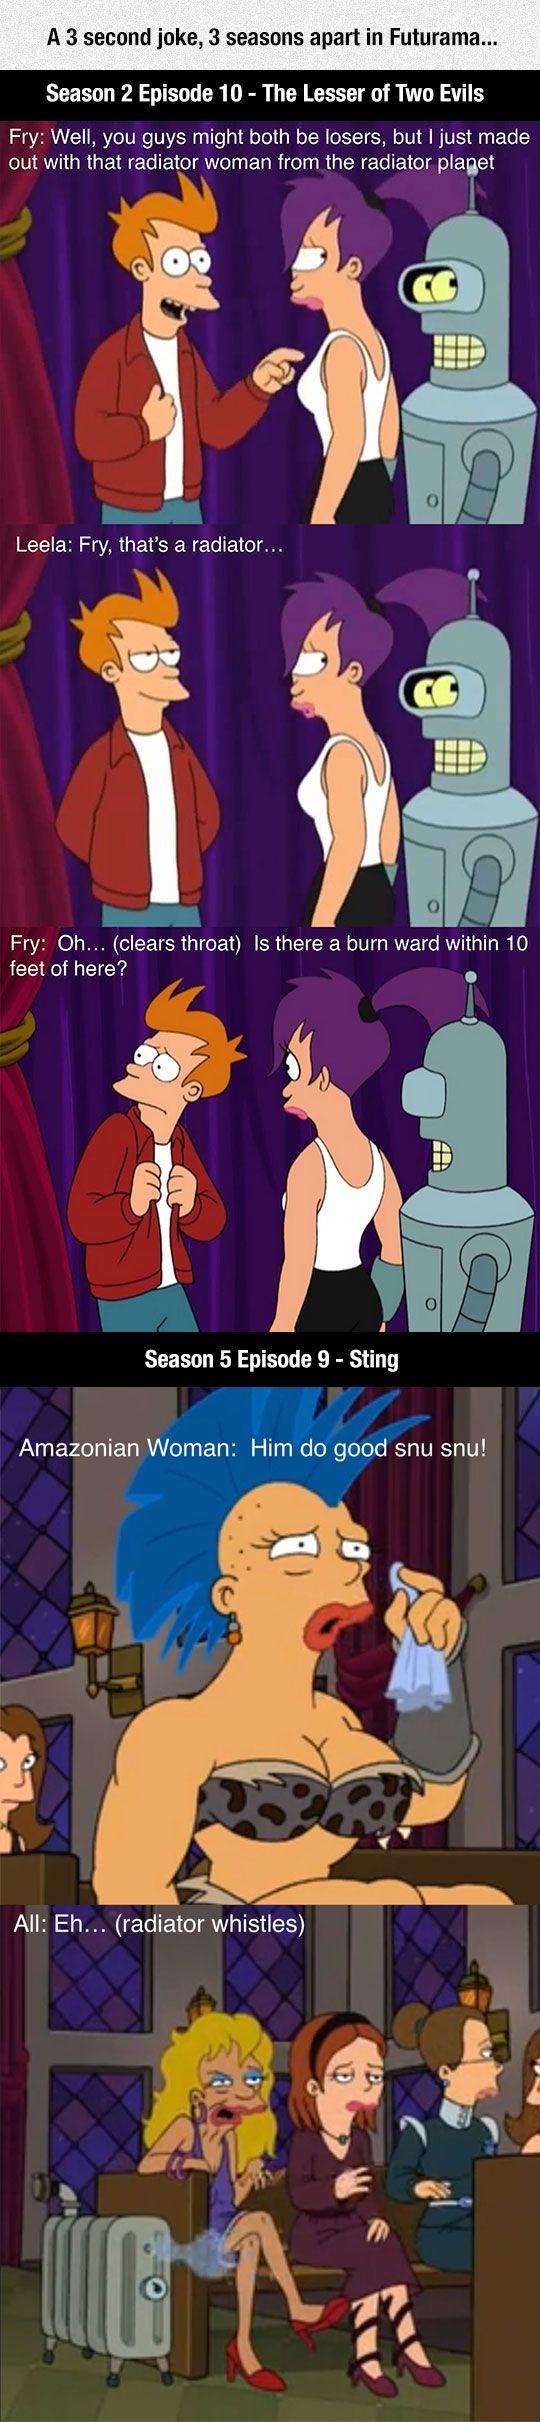 Awesome Futurama Writers Were Really Good